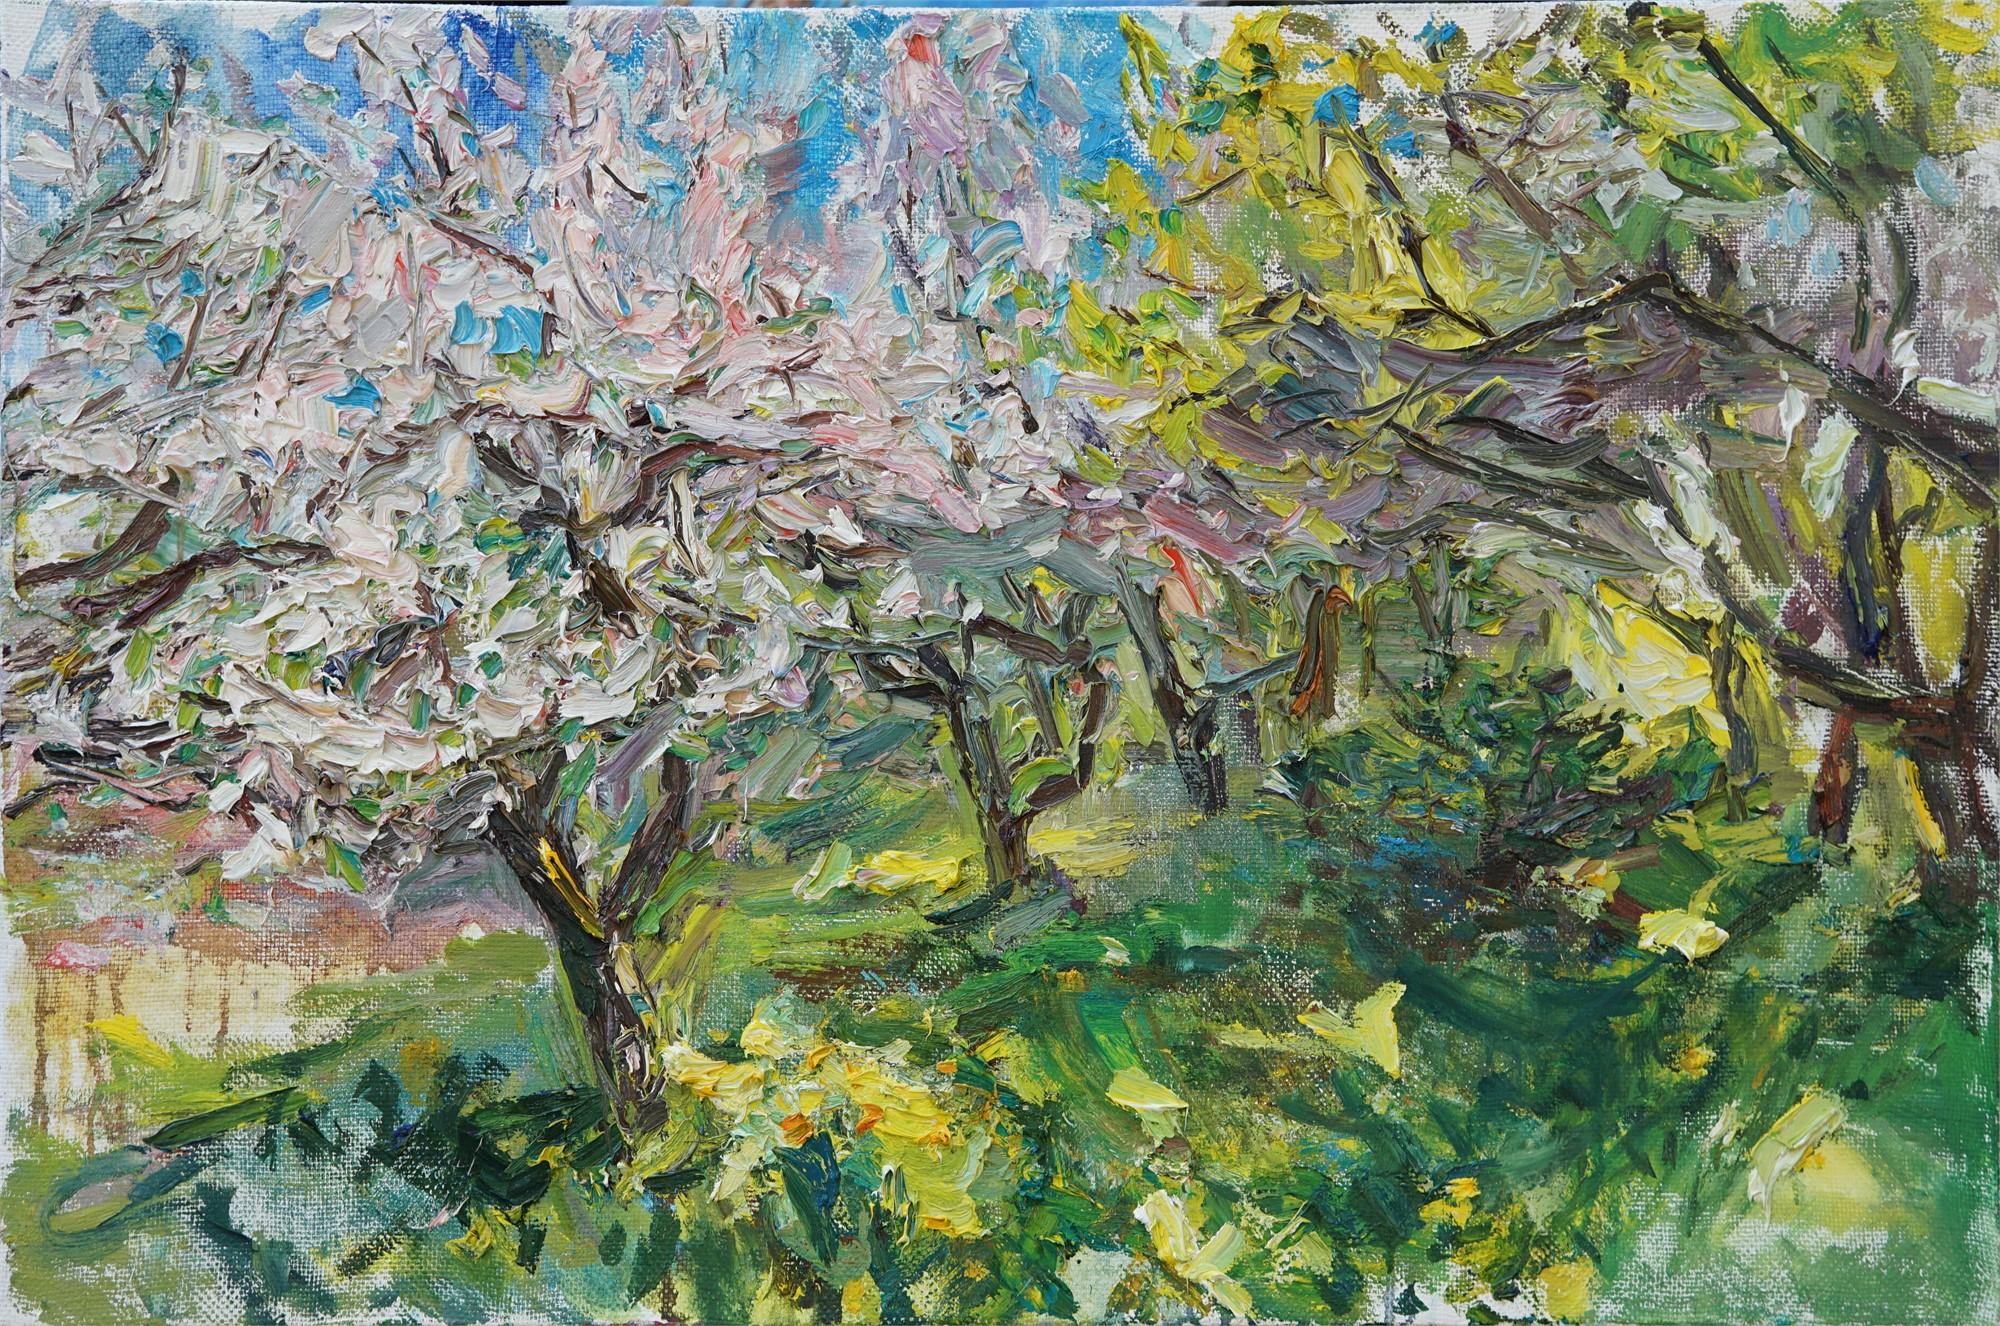 Cherry Blossom by Ulrich Gleiter